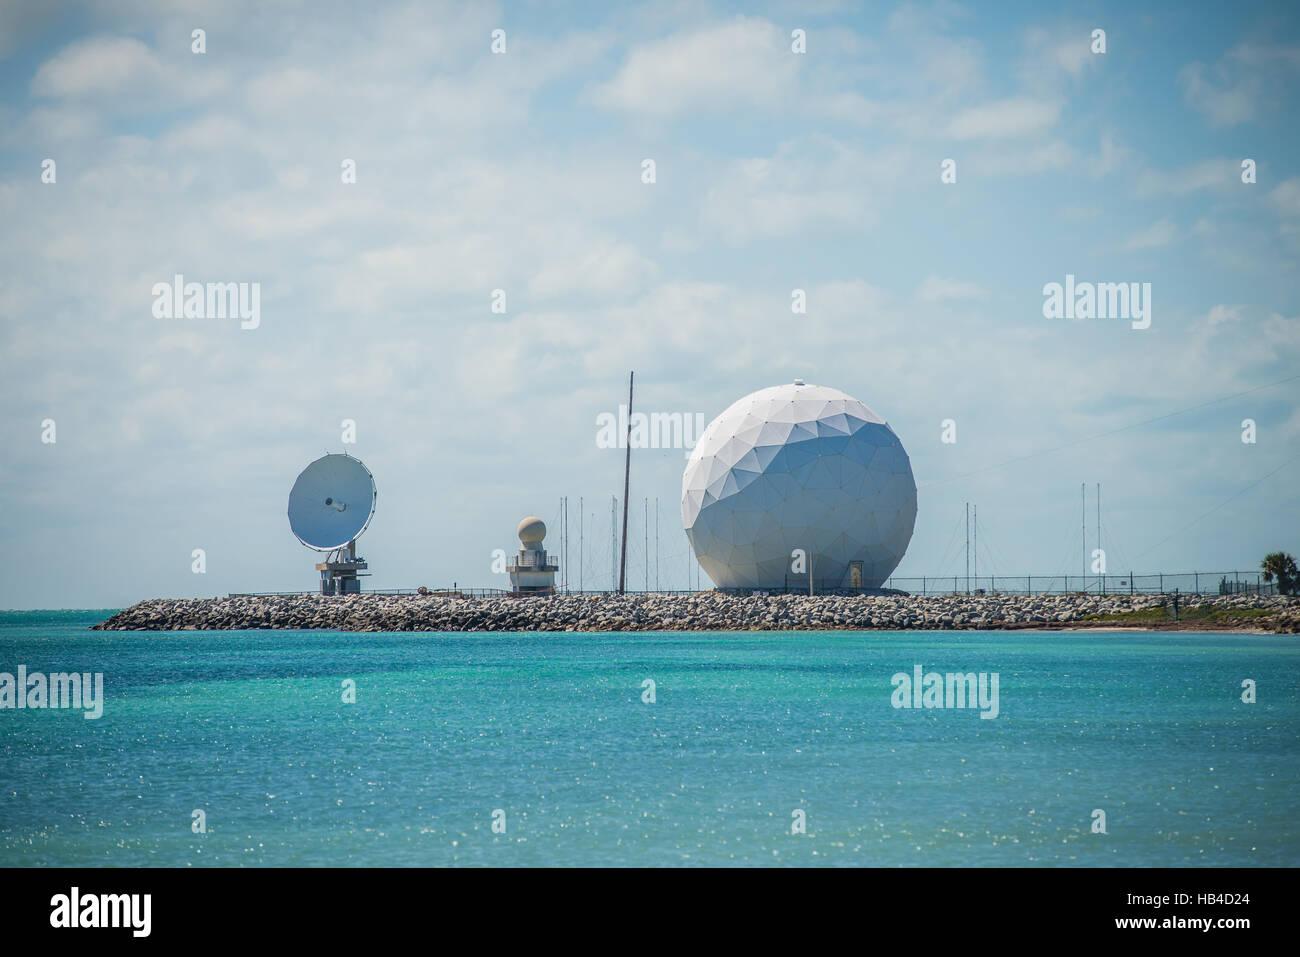 radar-dome-technology-on-the-sea-coast-HB4D24.jpg